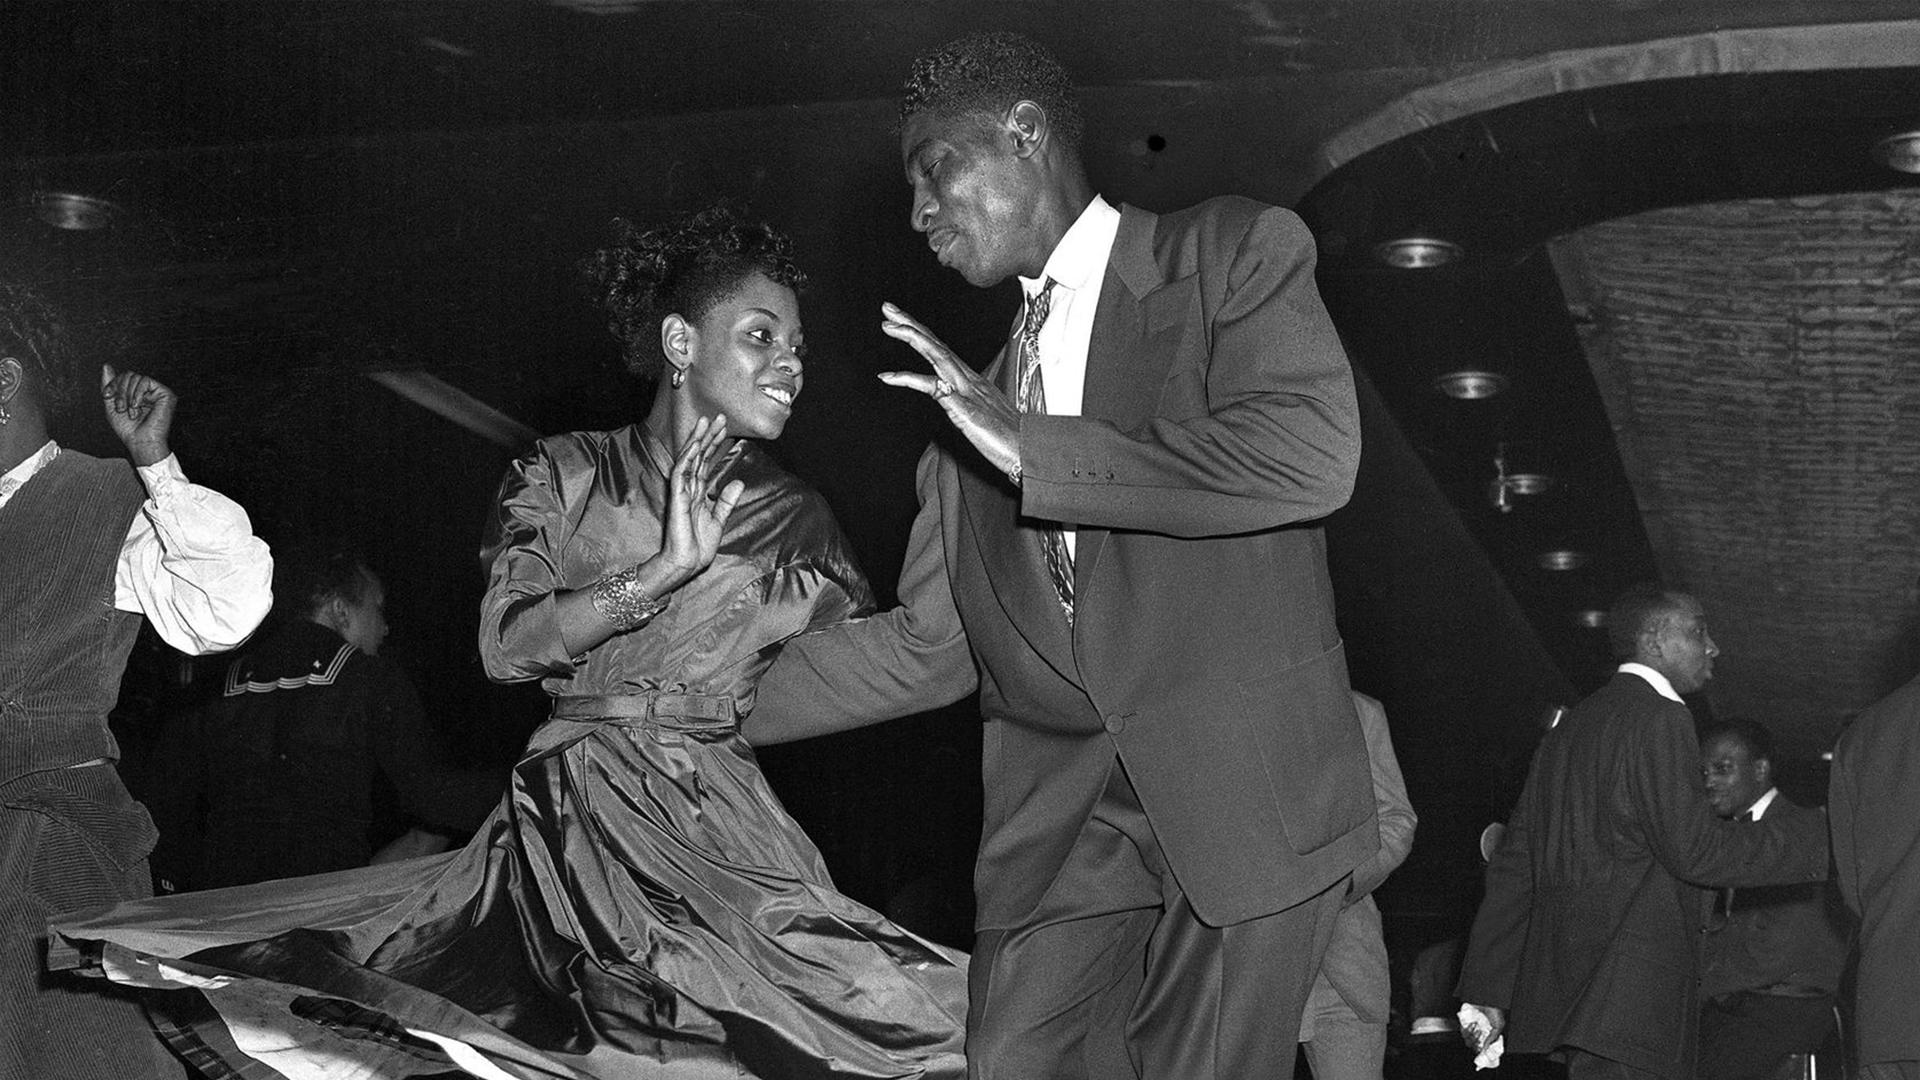 Black couple doing partnered dance